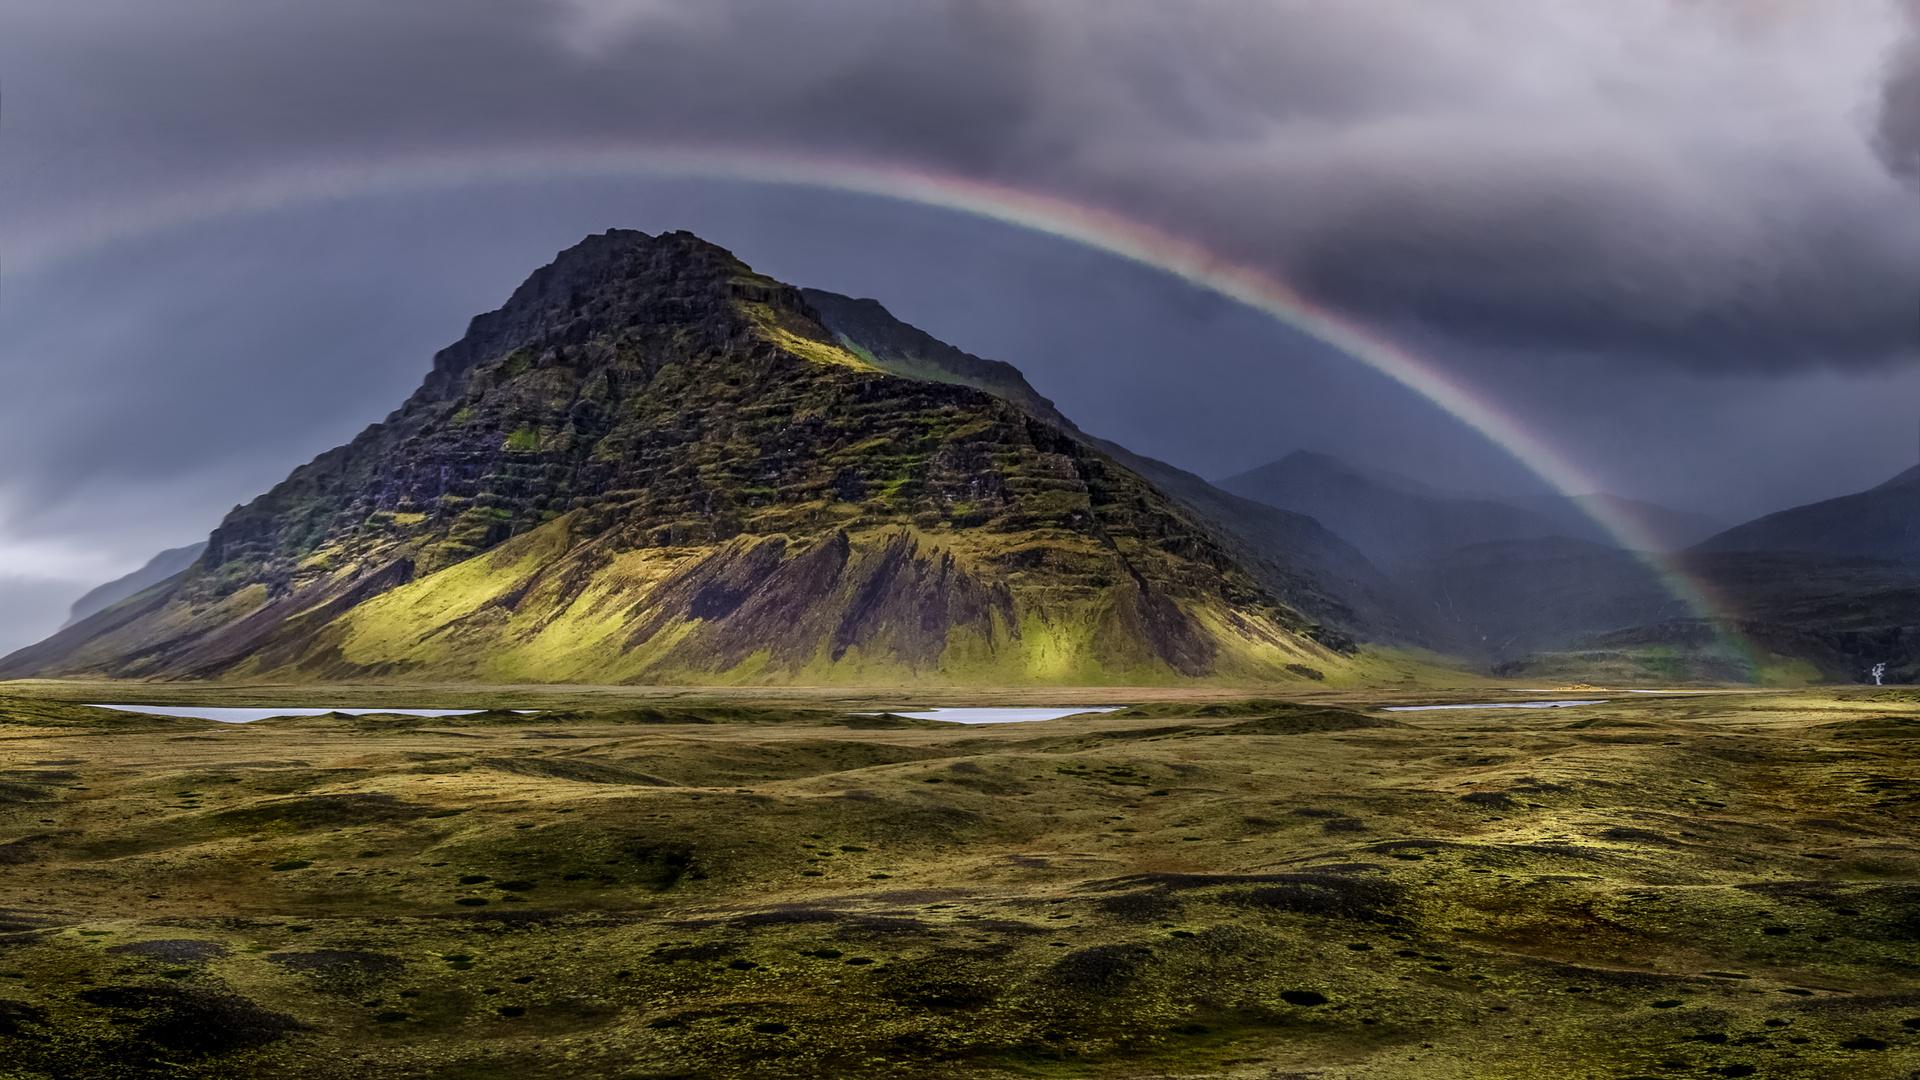 I like Iceland